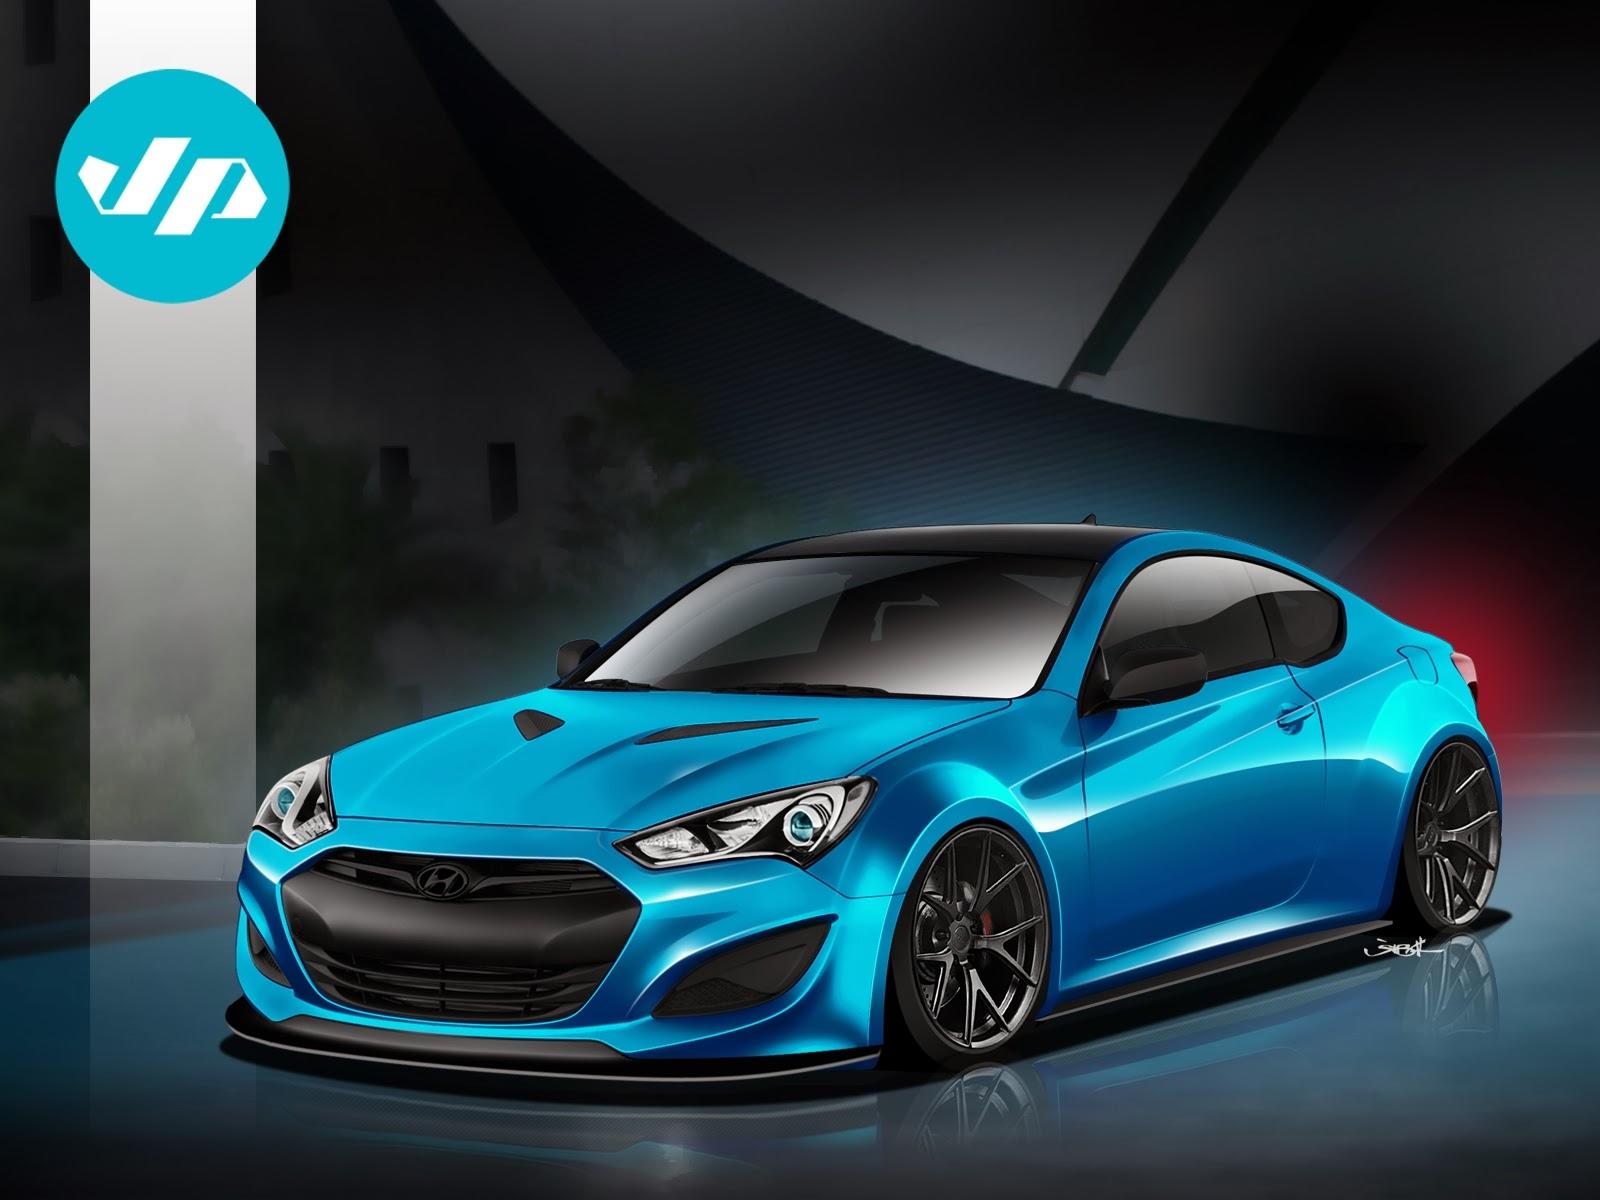 Hyundai sema vehicle preview jp edition genesis coupe